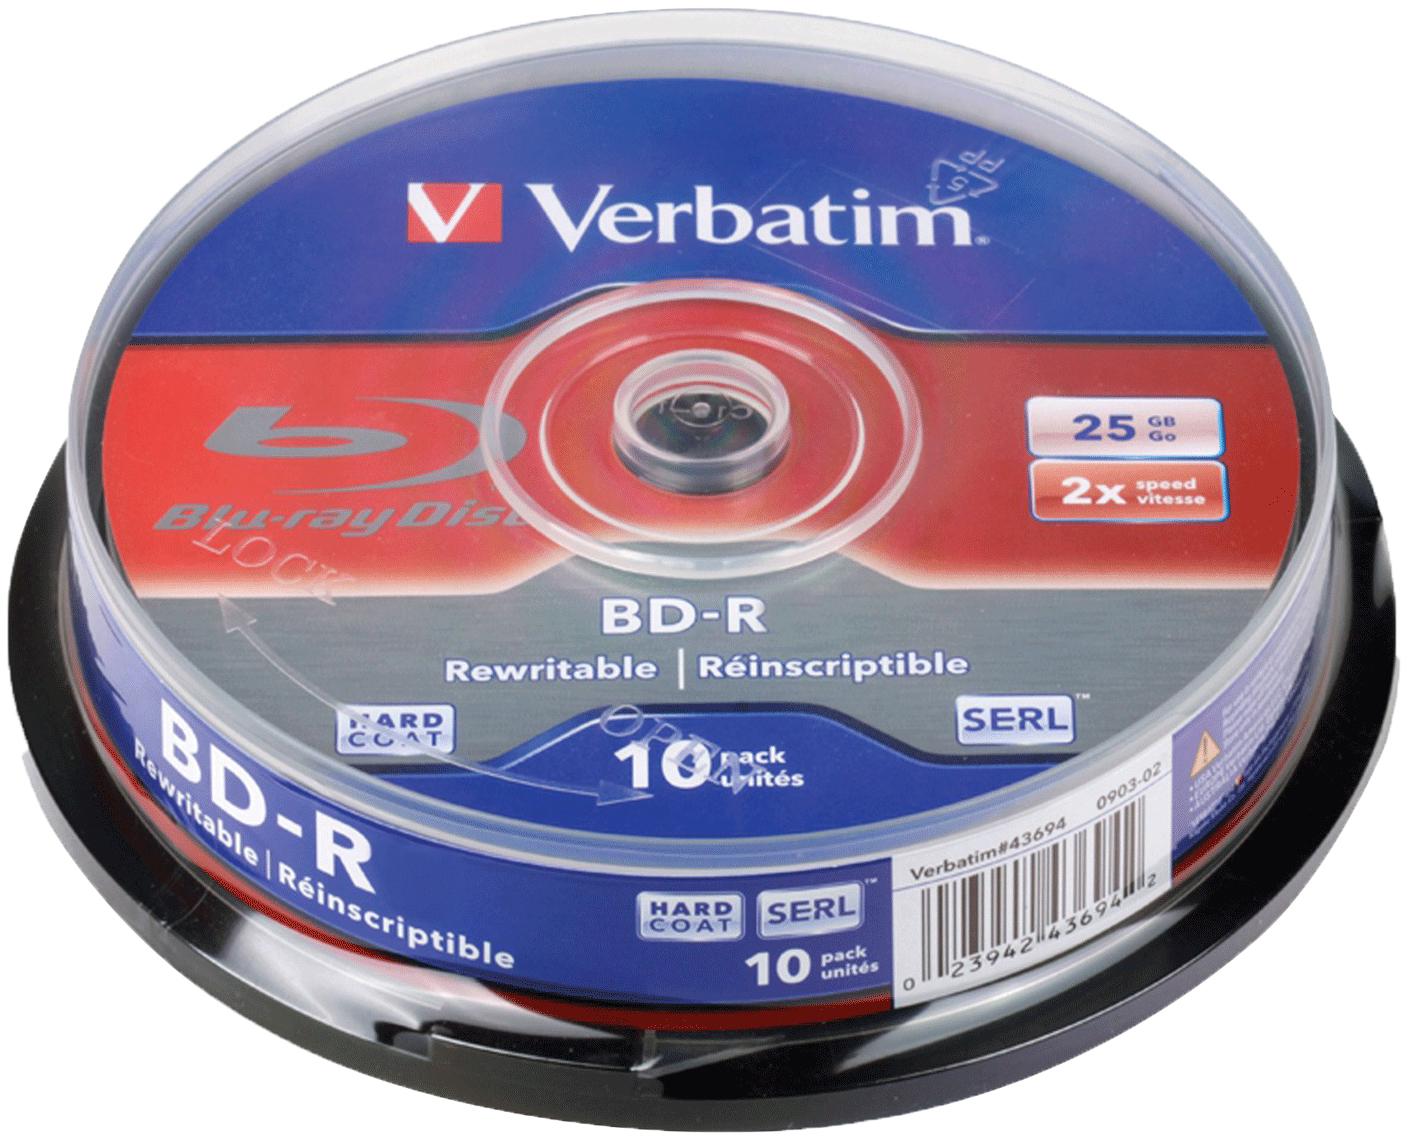 Диск Verbatim 43694 - характеристики, техническое описание - маркетплейс sbermegamarket.ru